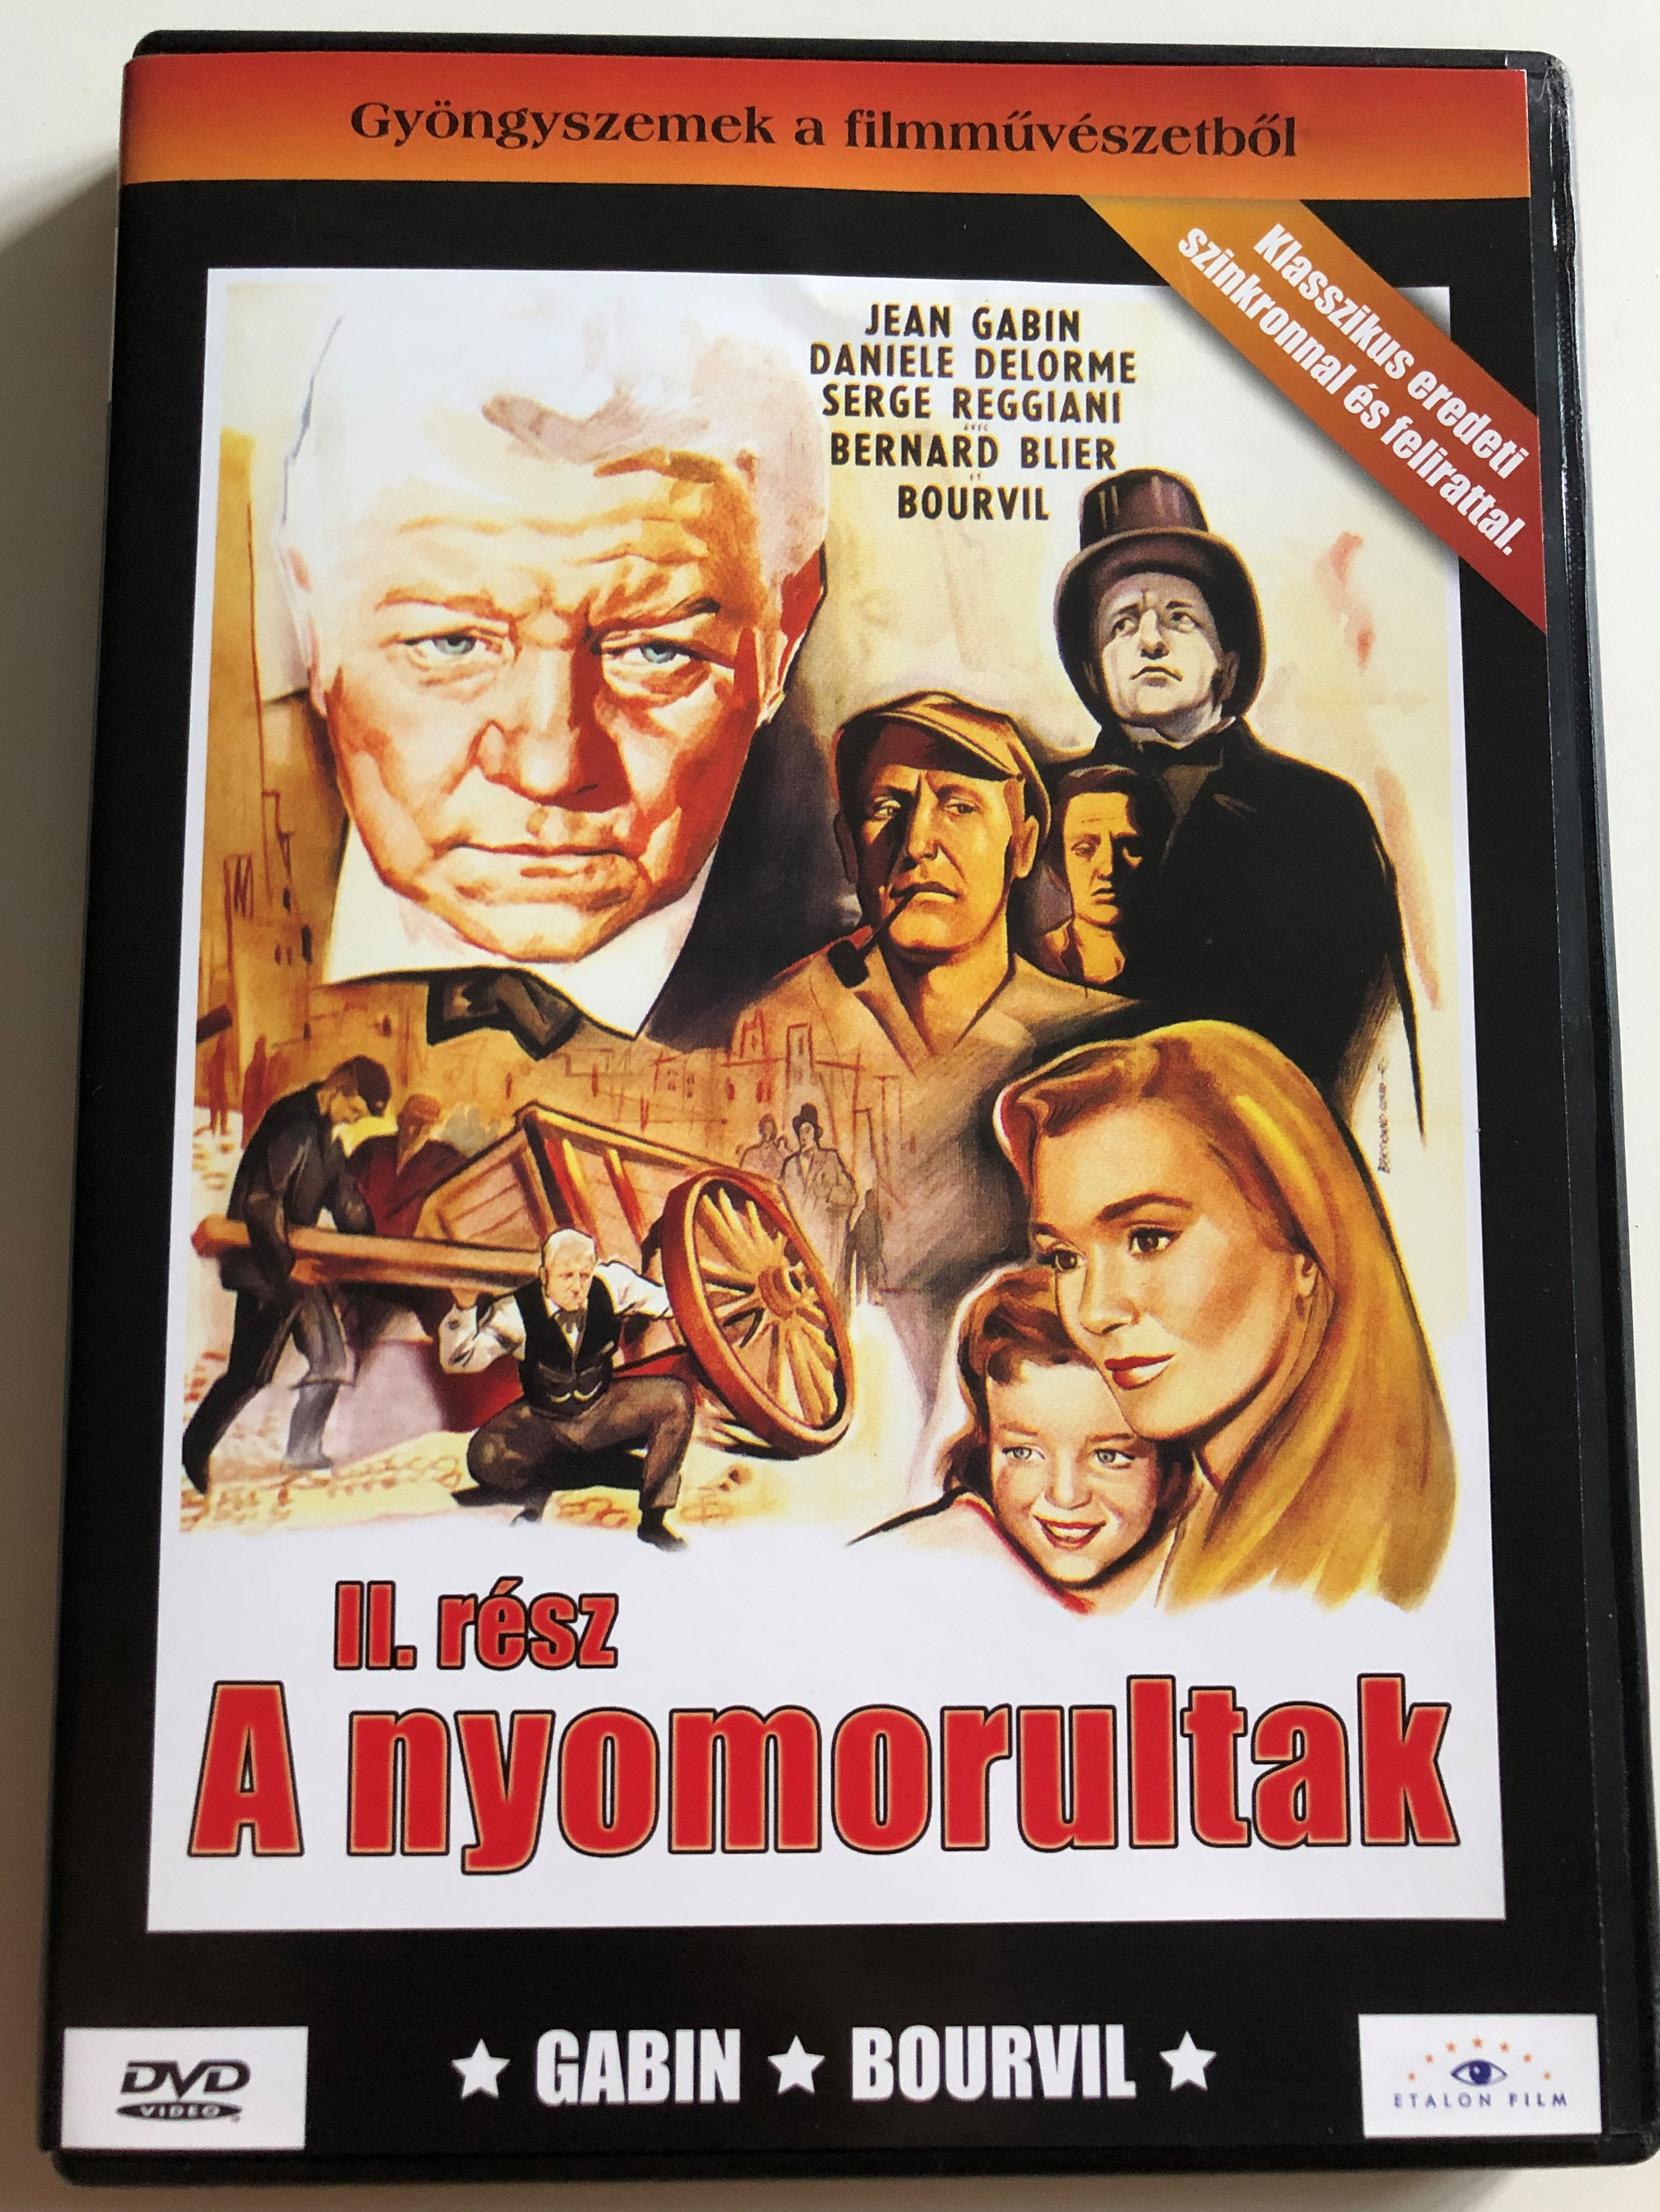 les-miserables-ii.-dvd-1958-a-nyomorultak-ii.-r-sz-directed-by-jean-paul-le-chanois-starring-jean-gabin-bernart-blier-bourvil-gy-ngyszemek-a-filmm-v-szetb-l-based-on-victor-hugo-s-novel-1-.jpg